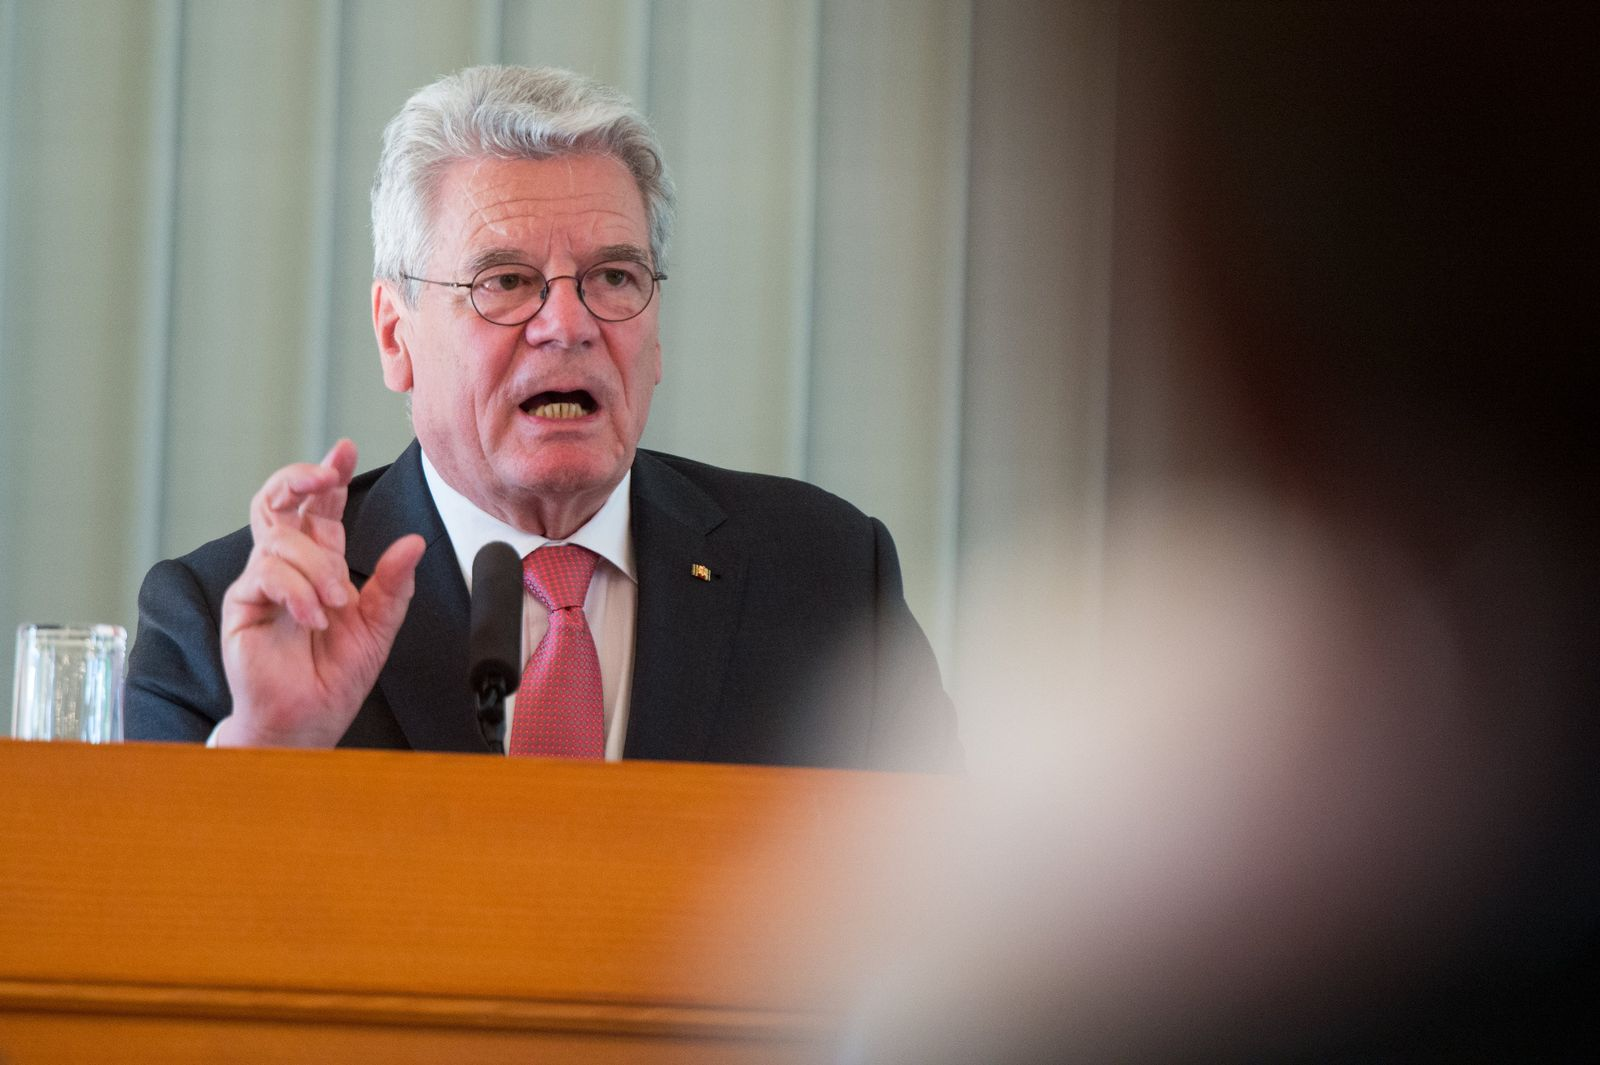 Bundespräsident Gauck besucht Norwegen